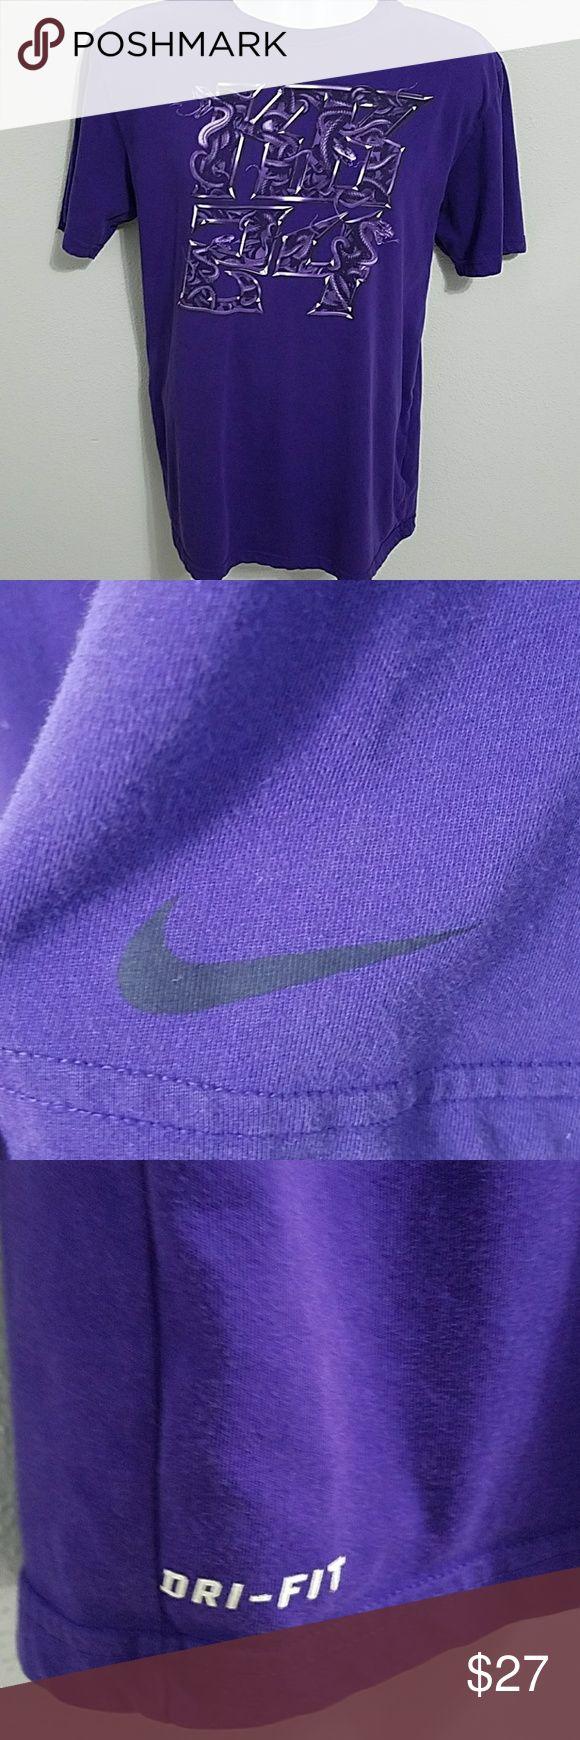 Kobe Bryant 24 Mamb Nike dri-fit t-shirt Kobe Bryant 24 Mamb snake t-shirt . If you have any questions please ask. (J-33) Nike Shirts Polos